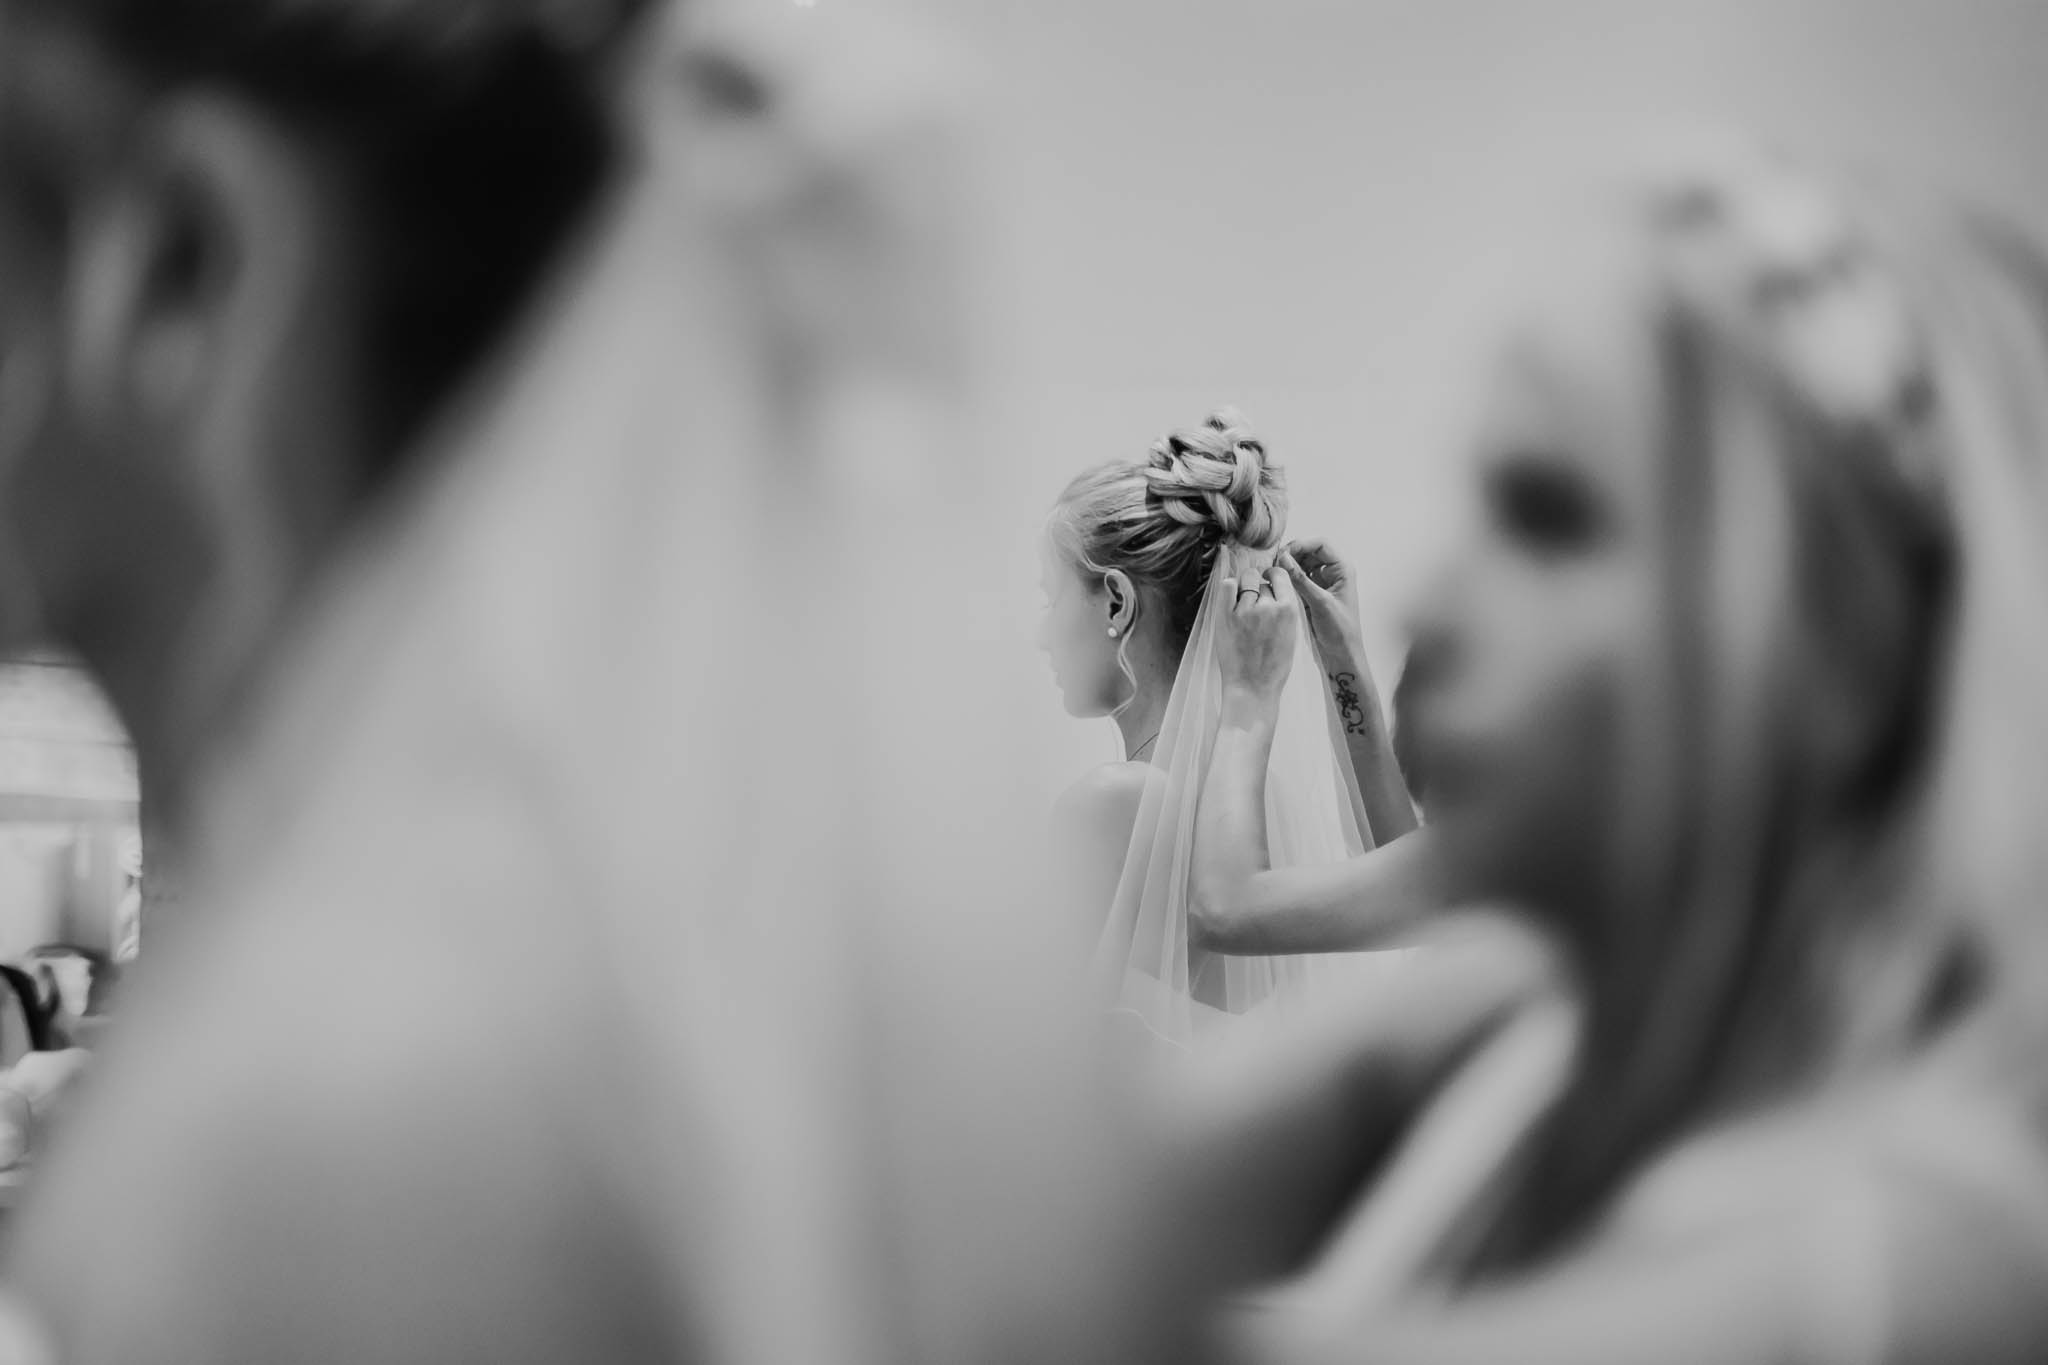 mariage-chateau-gaudras-ingold-10.jpg